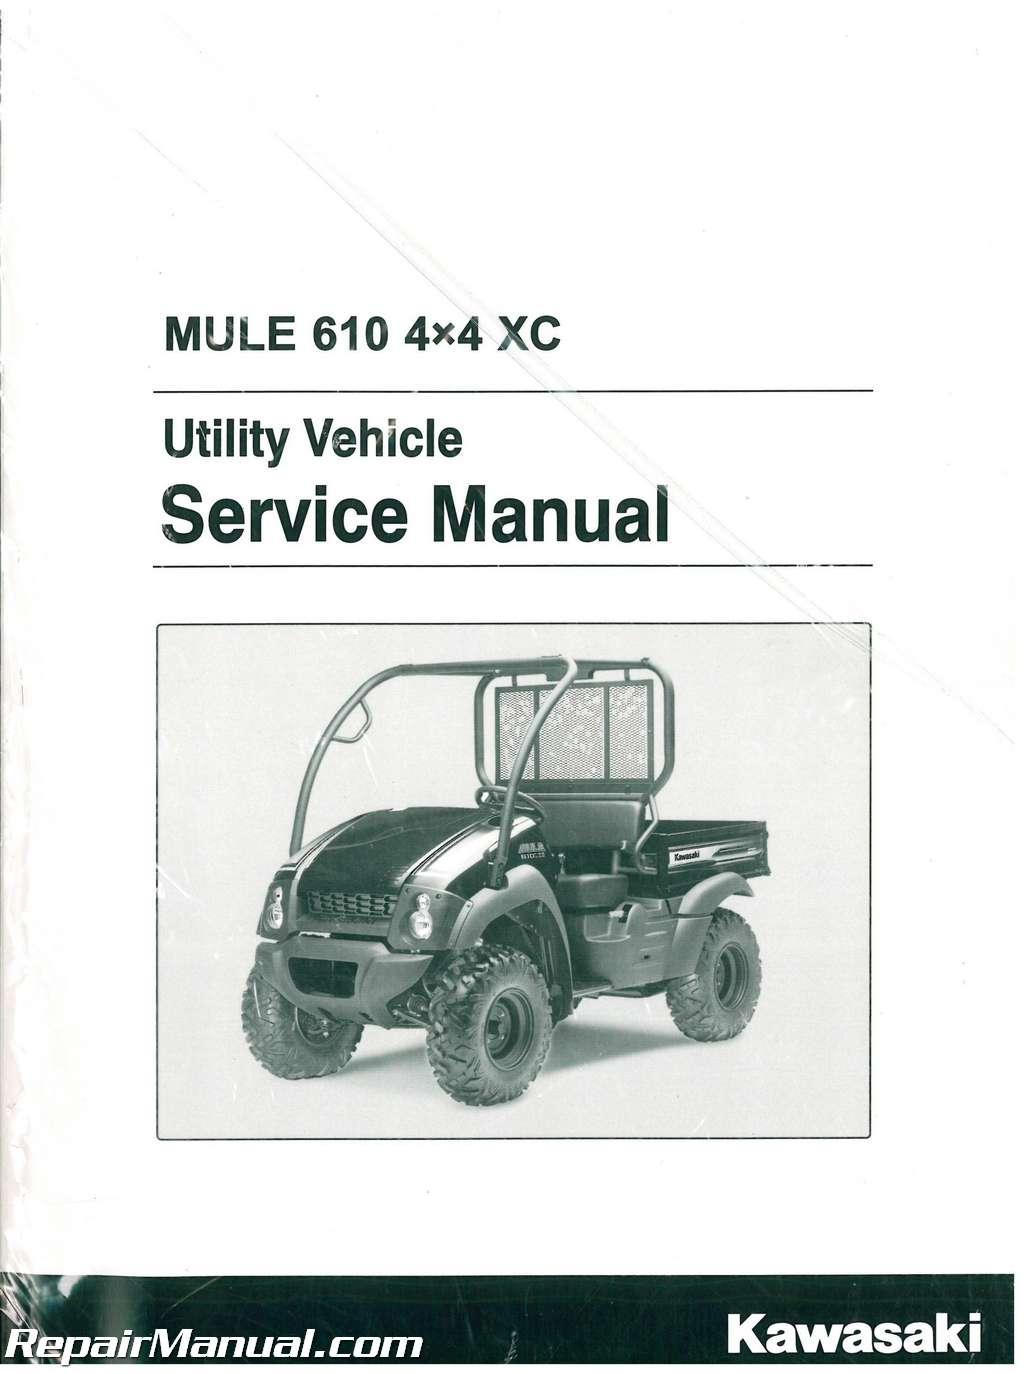 Service Manual For 2012 Kawasaki Mule 610 2015 Teryx Wiring Schematic 2010 2016 Kaf400d 4 Xc Rh Repairmanual Com Ignition Diagram Fuel Pump Problems